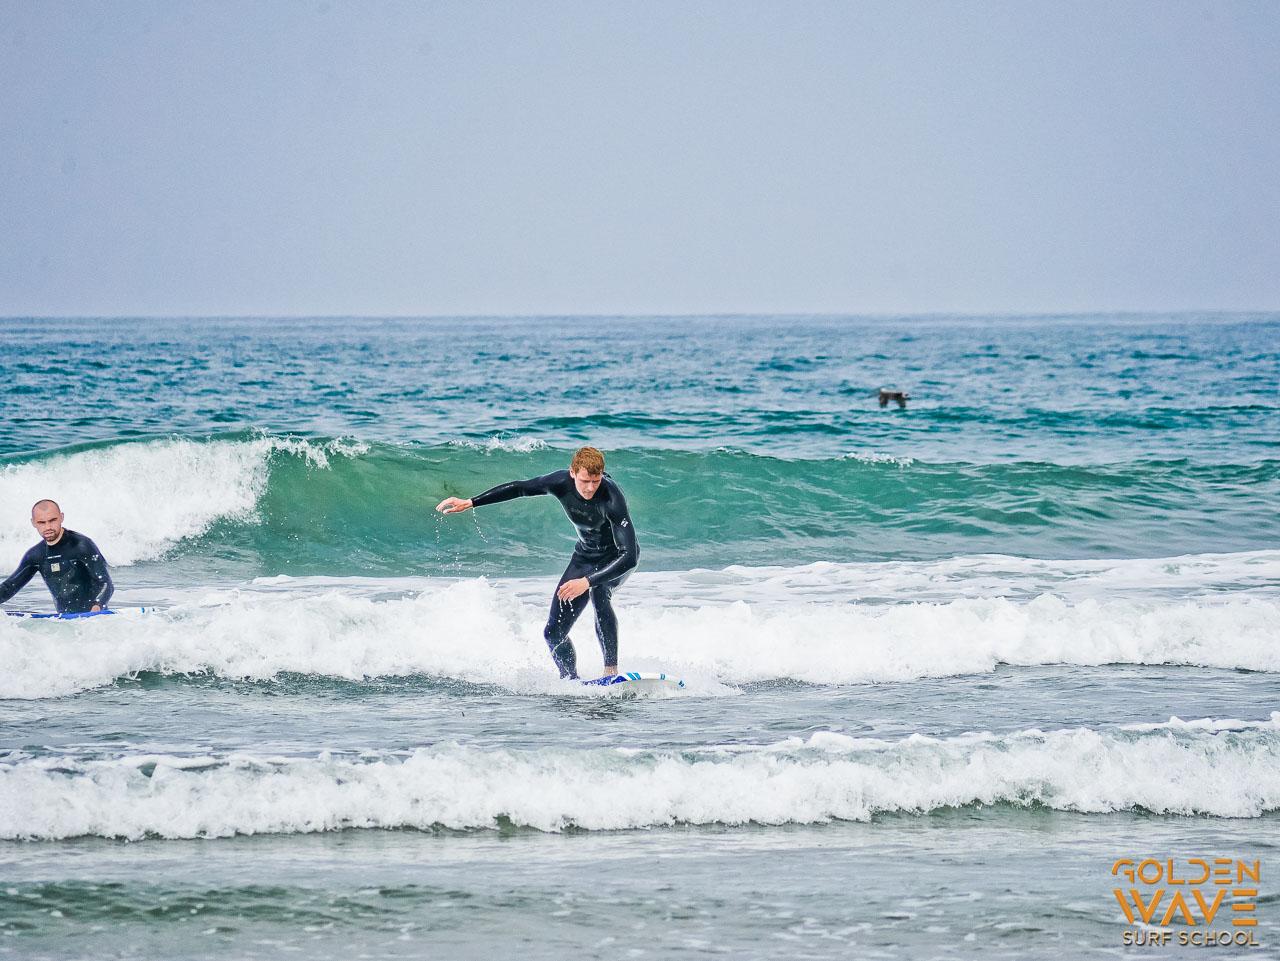 Golden Wave surf school, surf lesson, beginner surfer, surf student, surf school in LA, California, Malibu, Venice surfing lessons, Surfboard & wetsuits rentals.